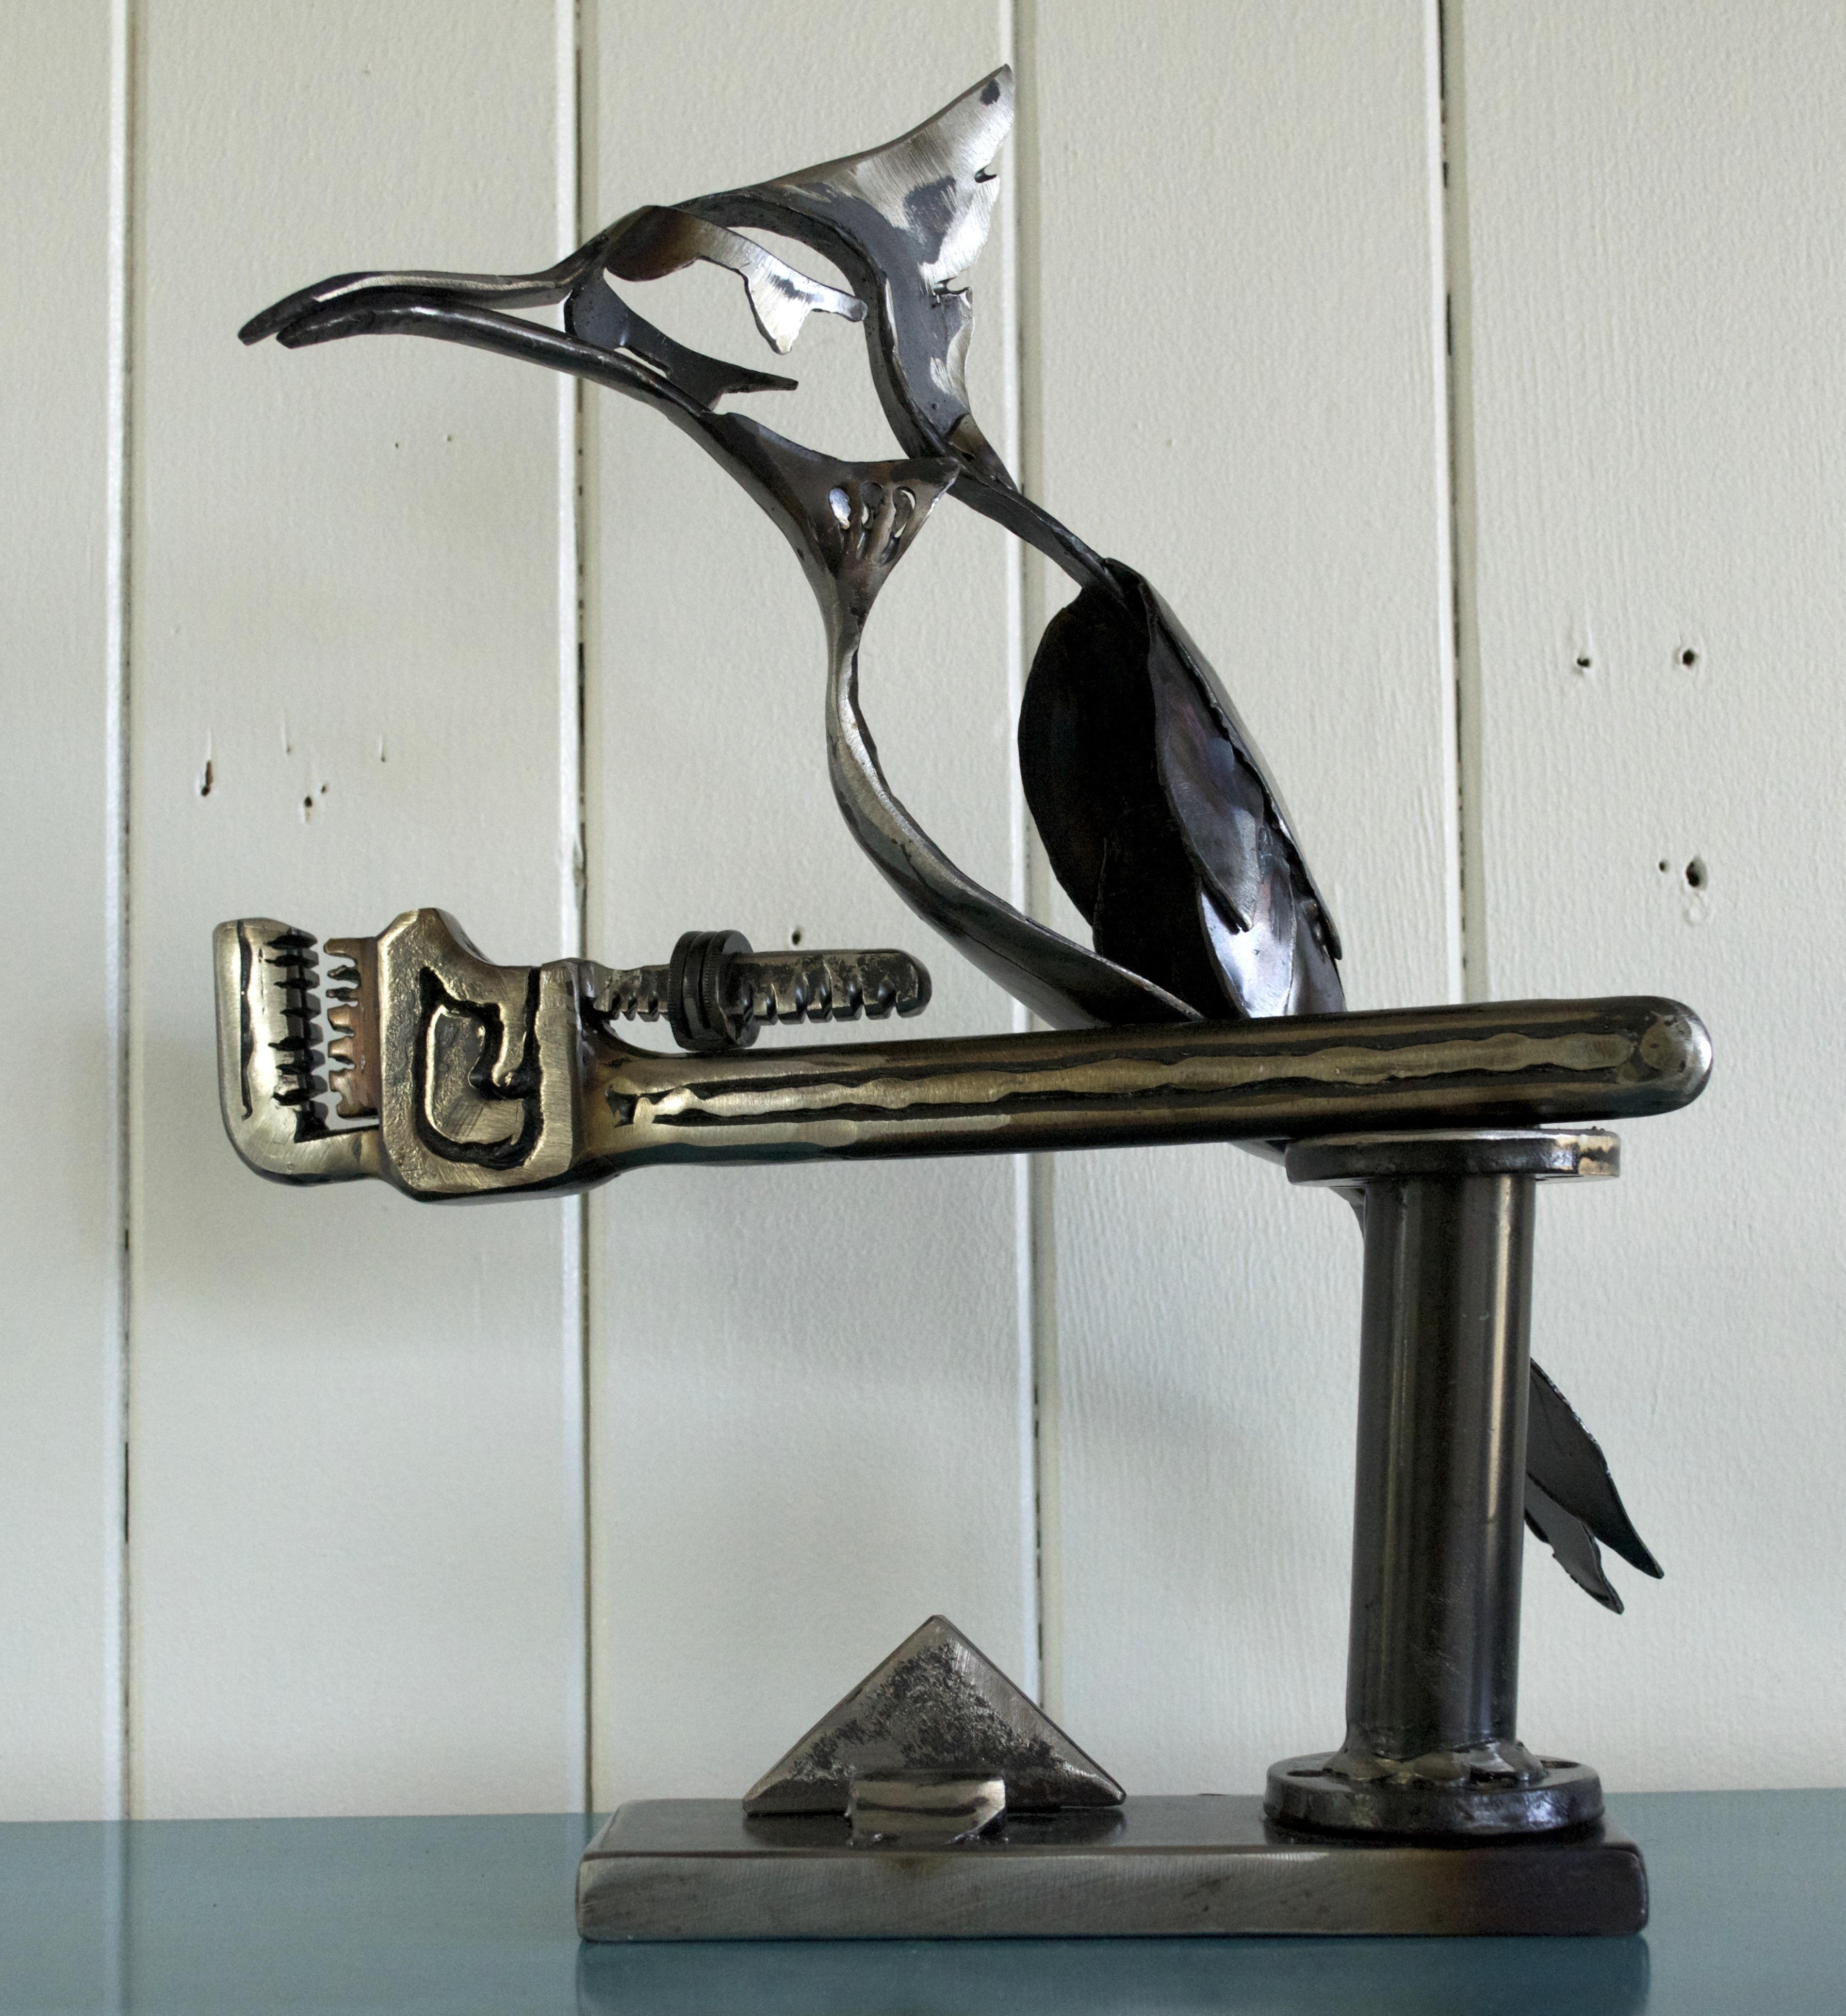 Bird Plumbing custom cardholder